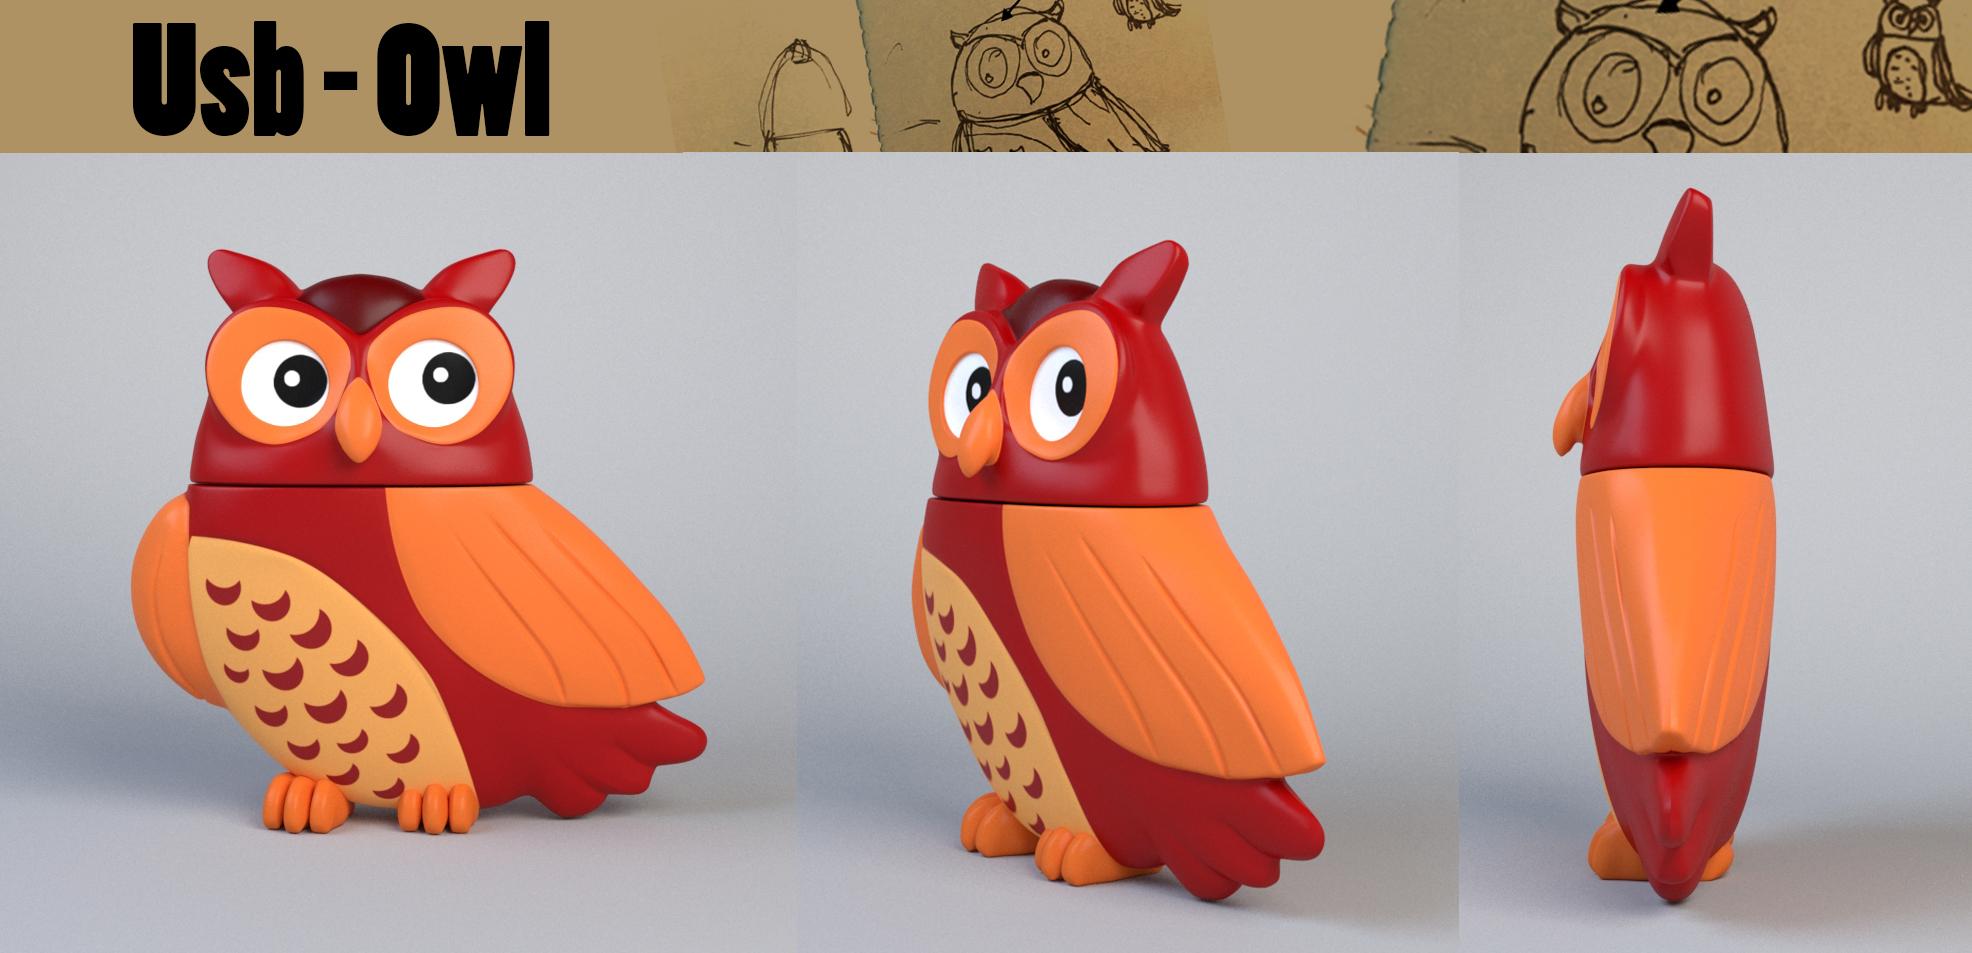 Usb_owl